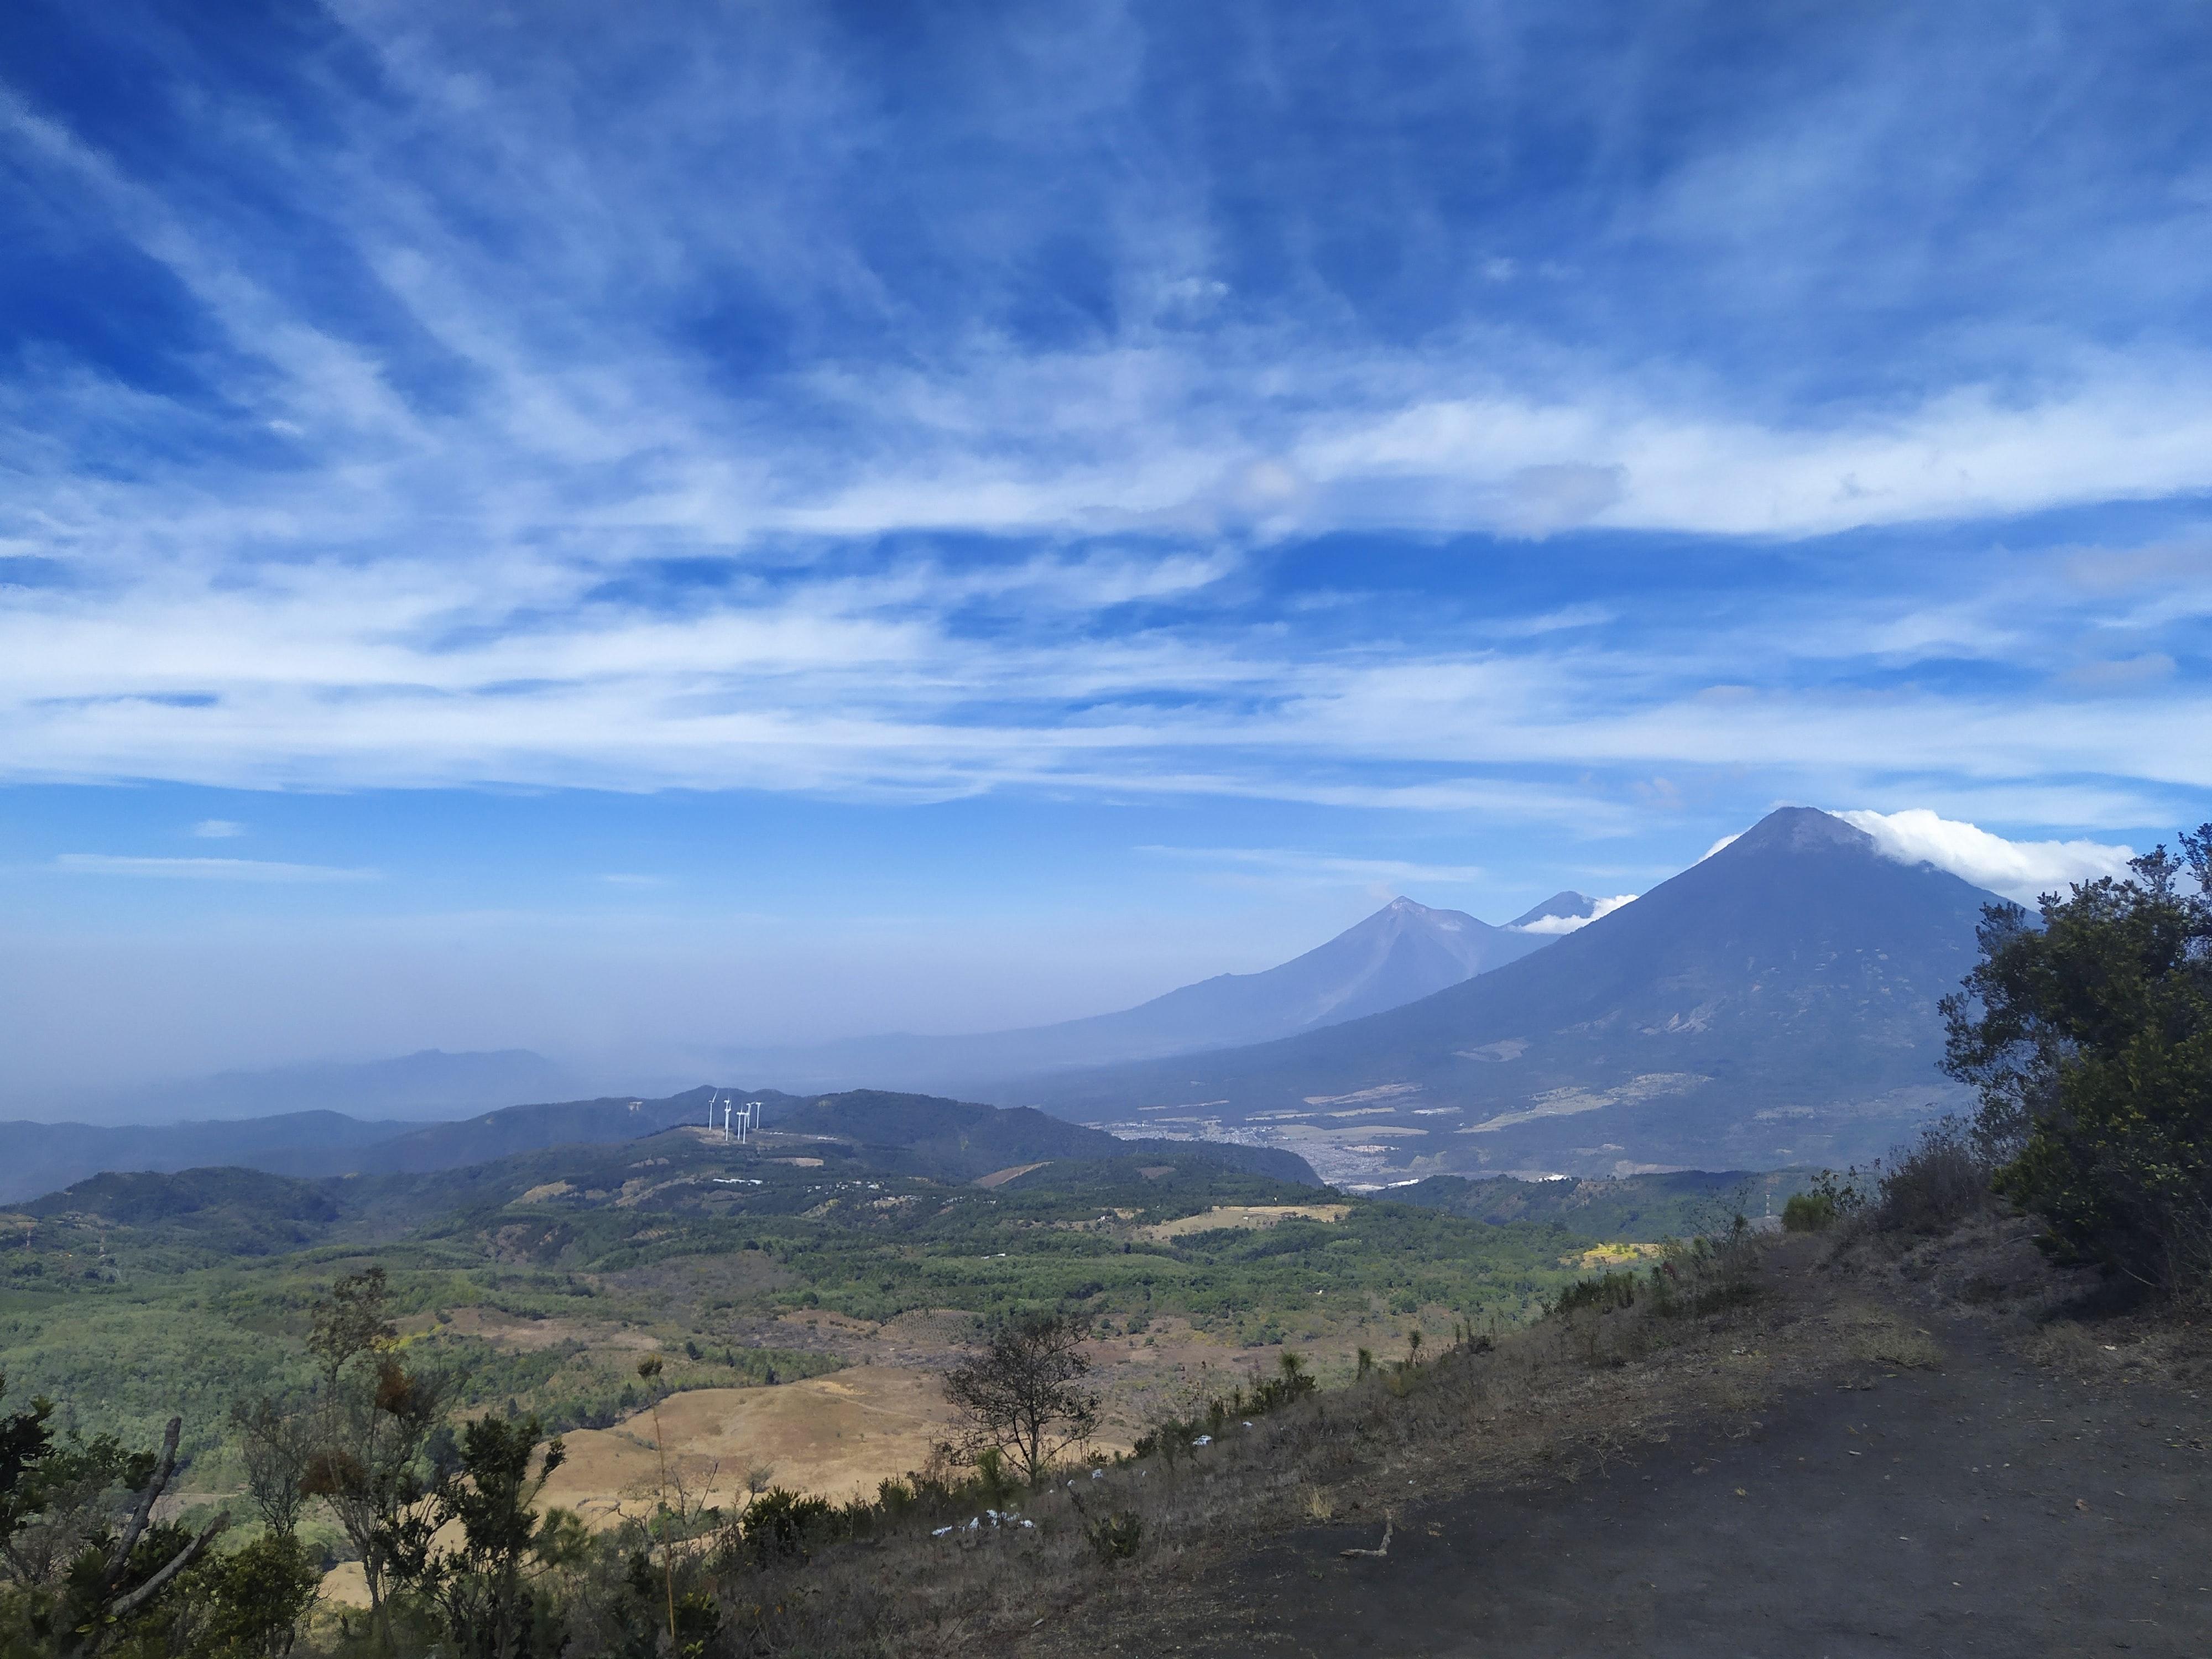 Pacaya Volcano Guatemala Photo by レオネル ラム